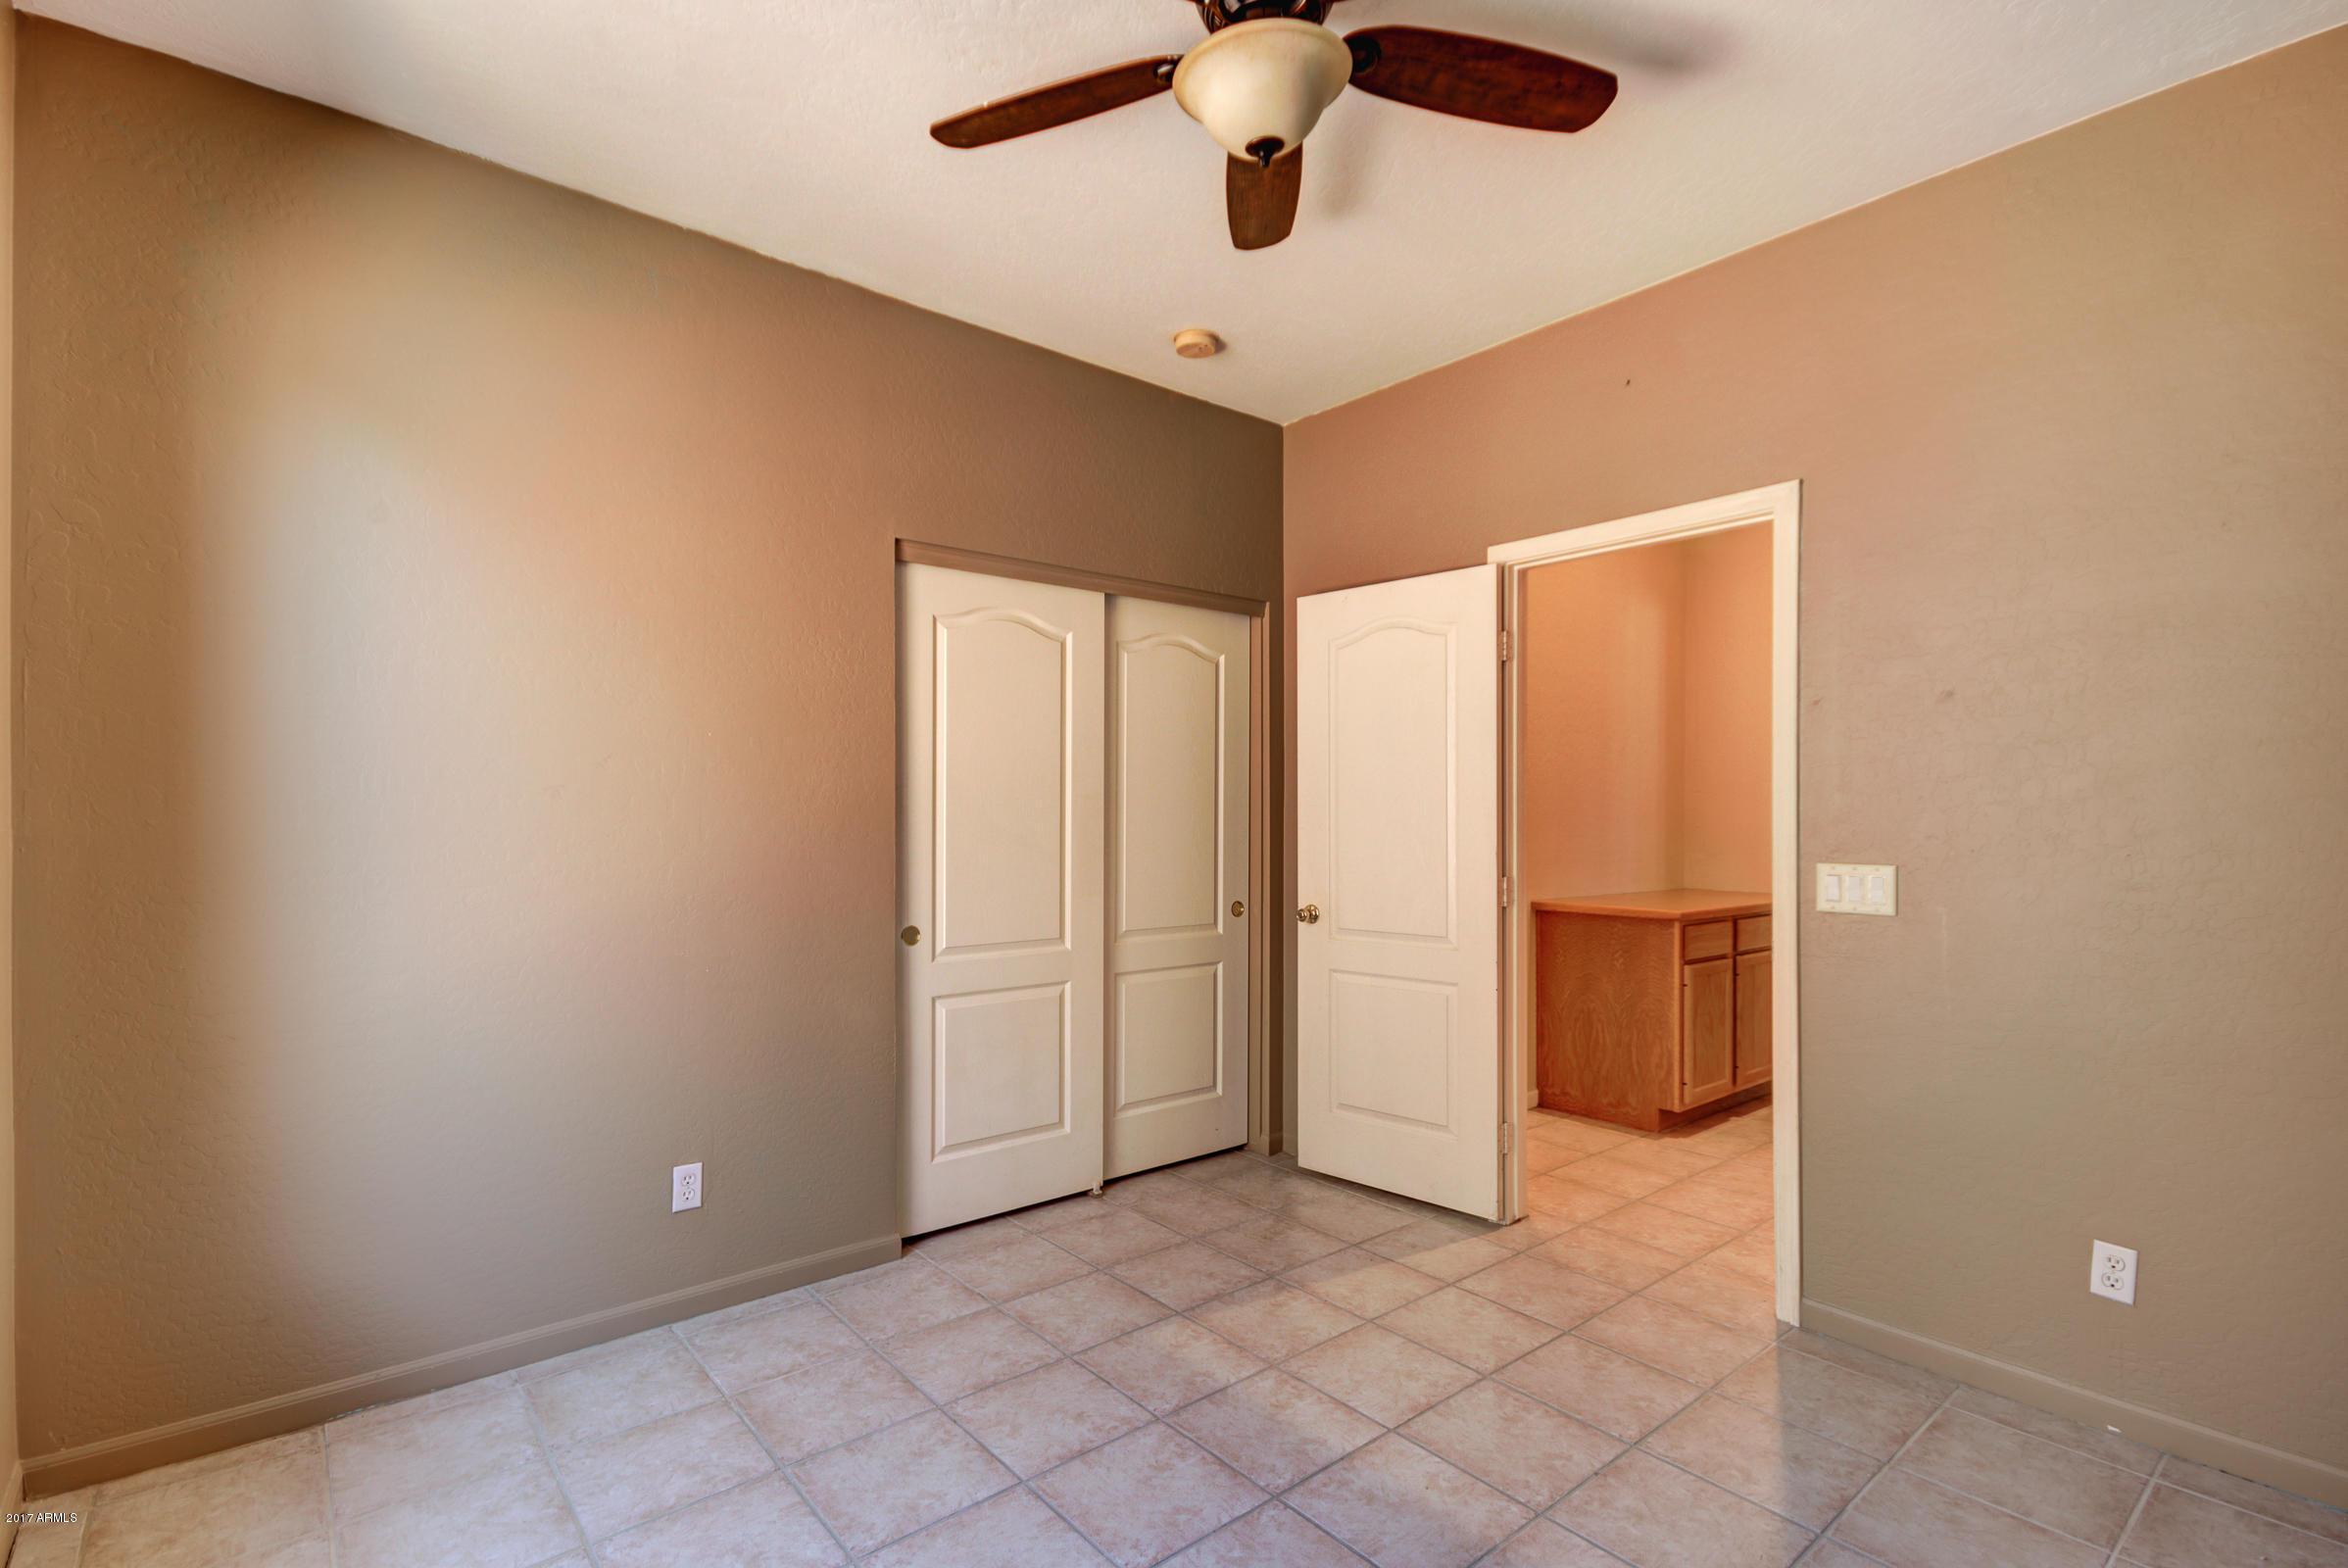 304 S Ironwood  Street Gilbert, AZ 85296 - img25